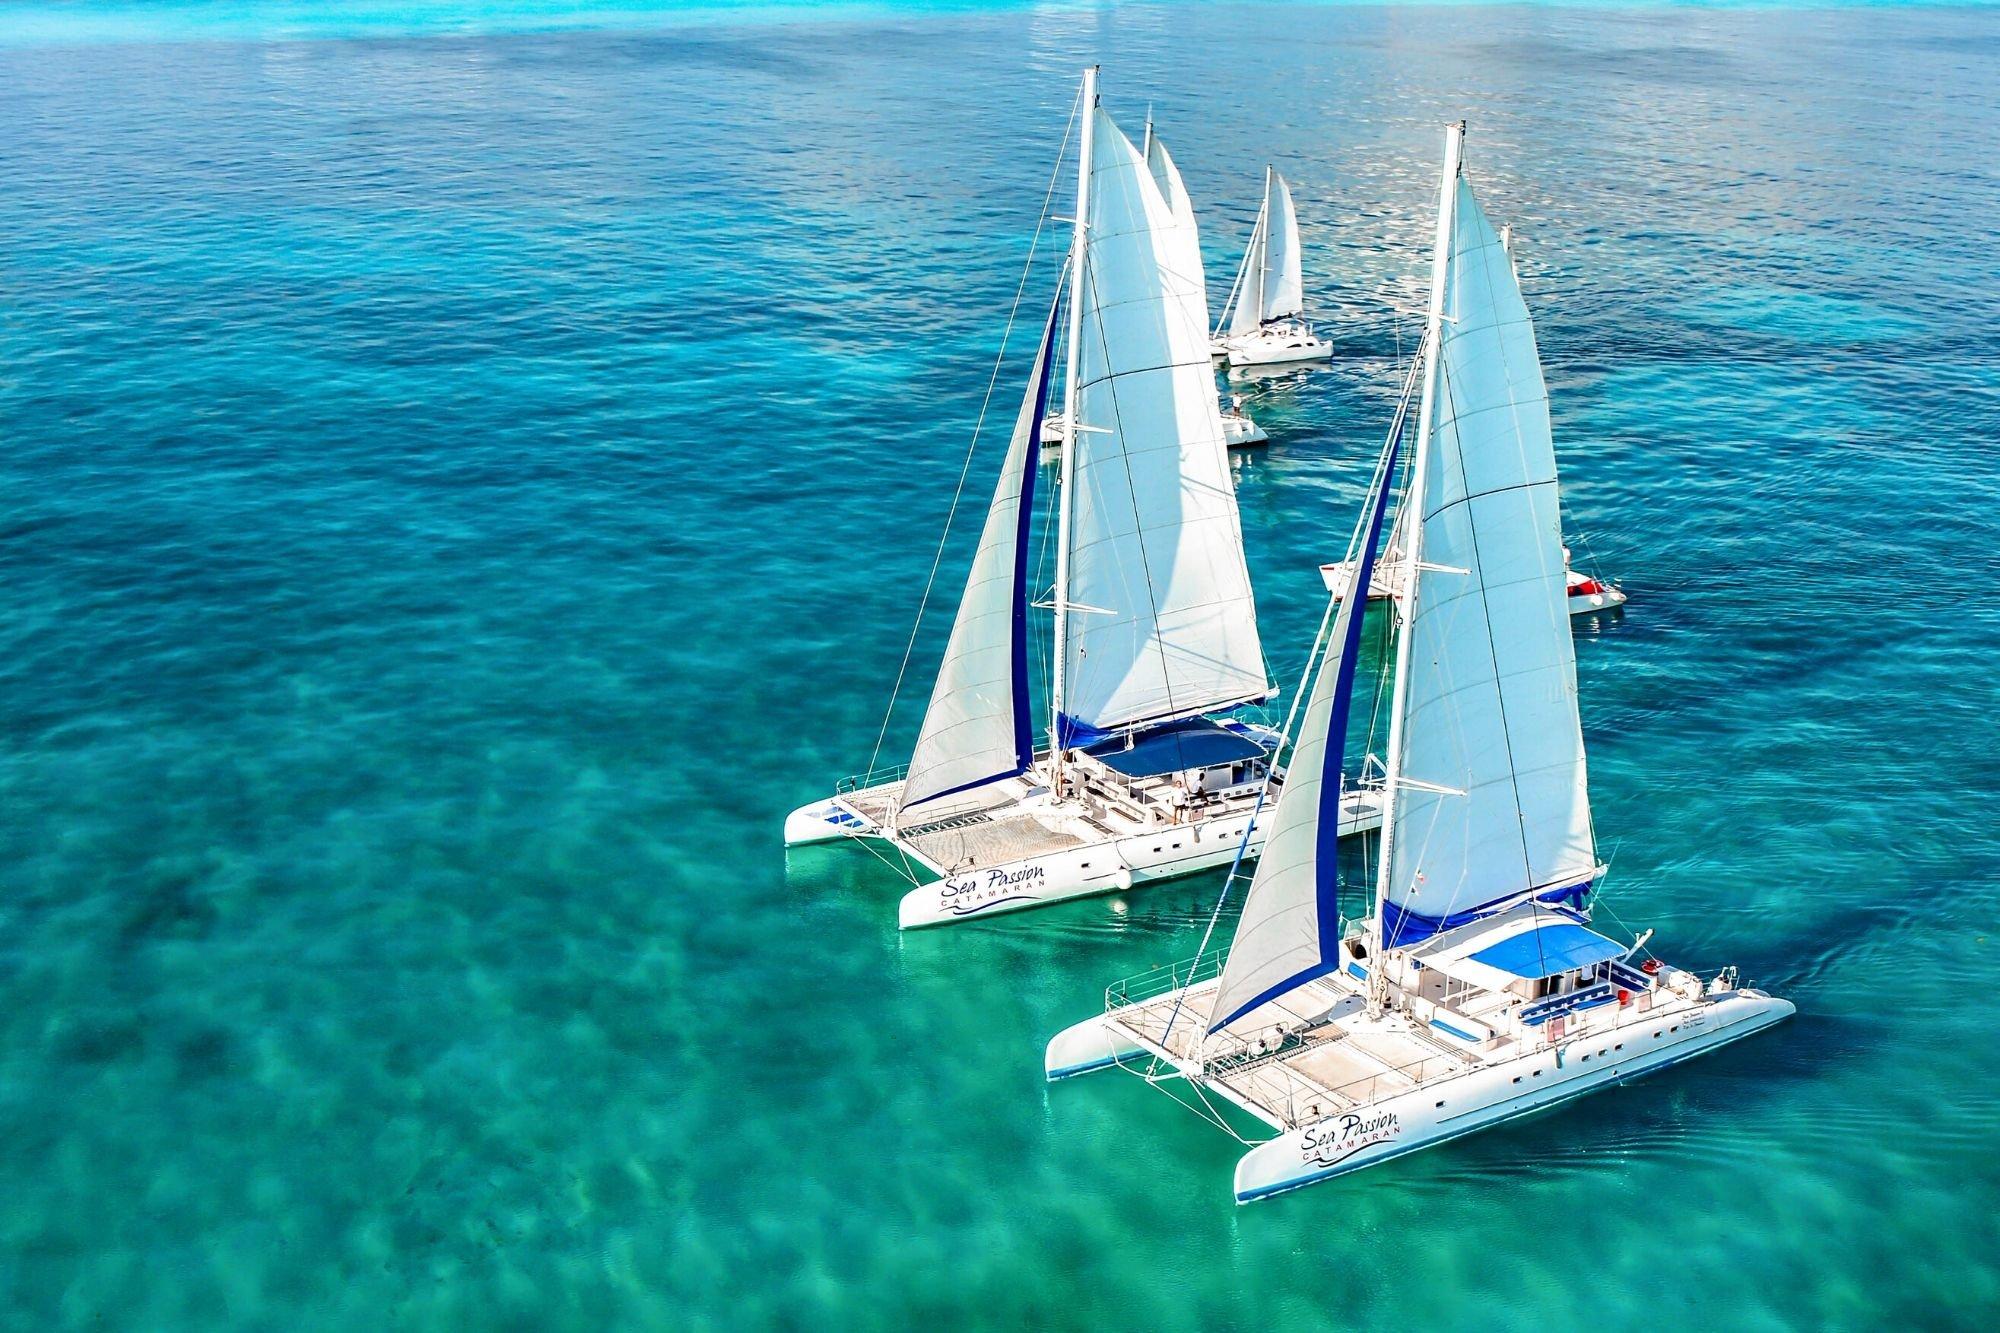 1 - HiRes - Private Isla Mujeres tour in catamaran - Sea Passion I II - Cancun Sailing